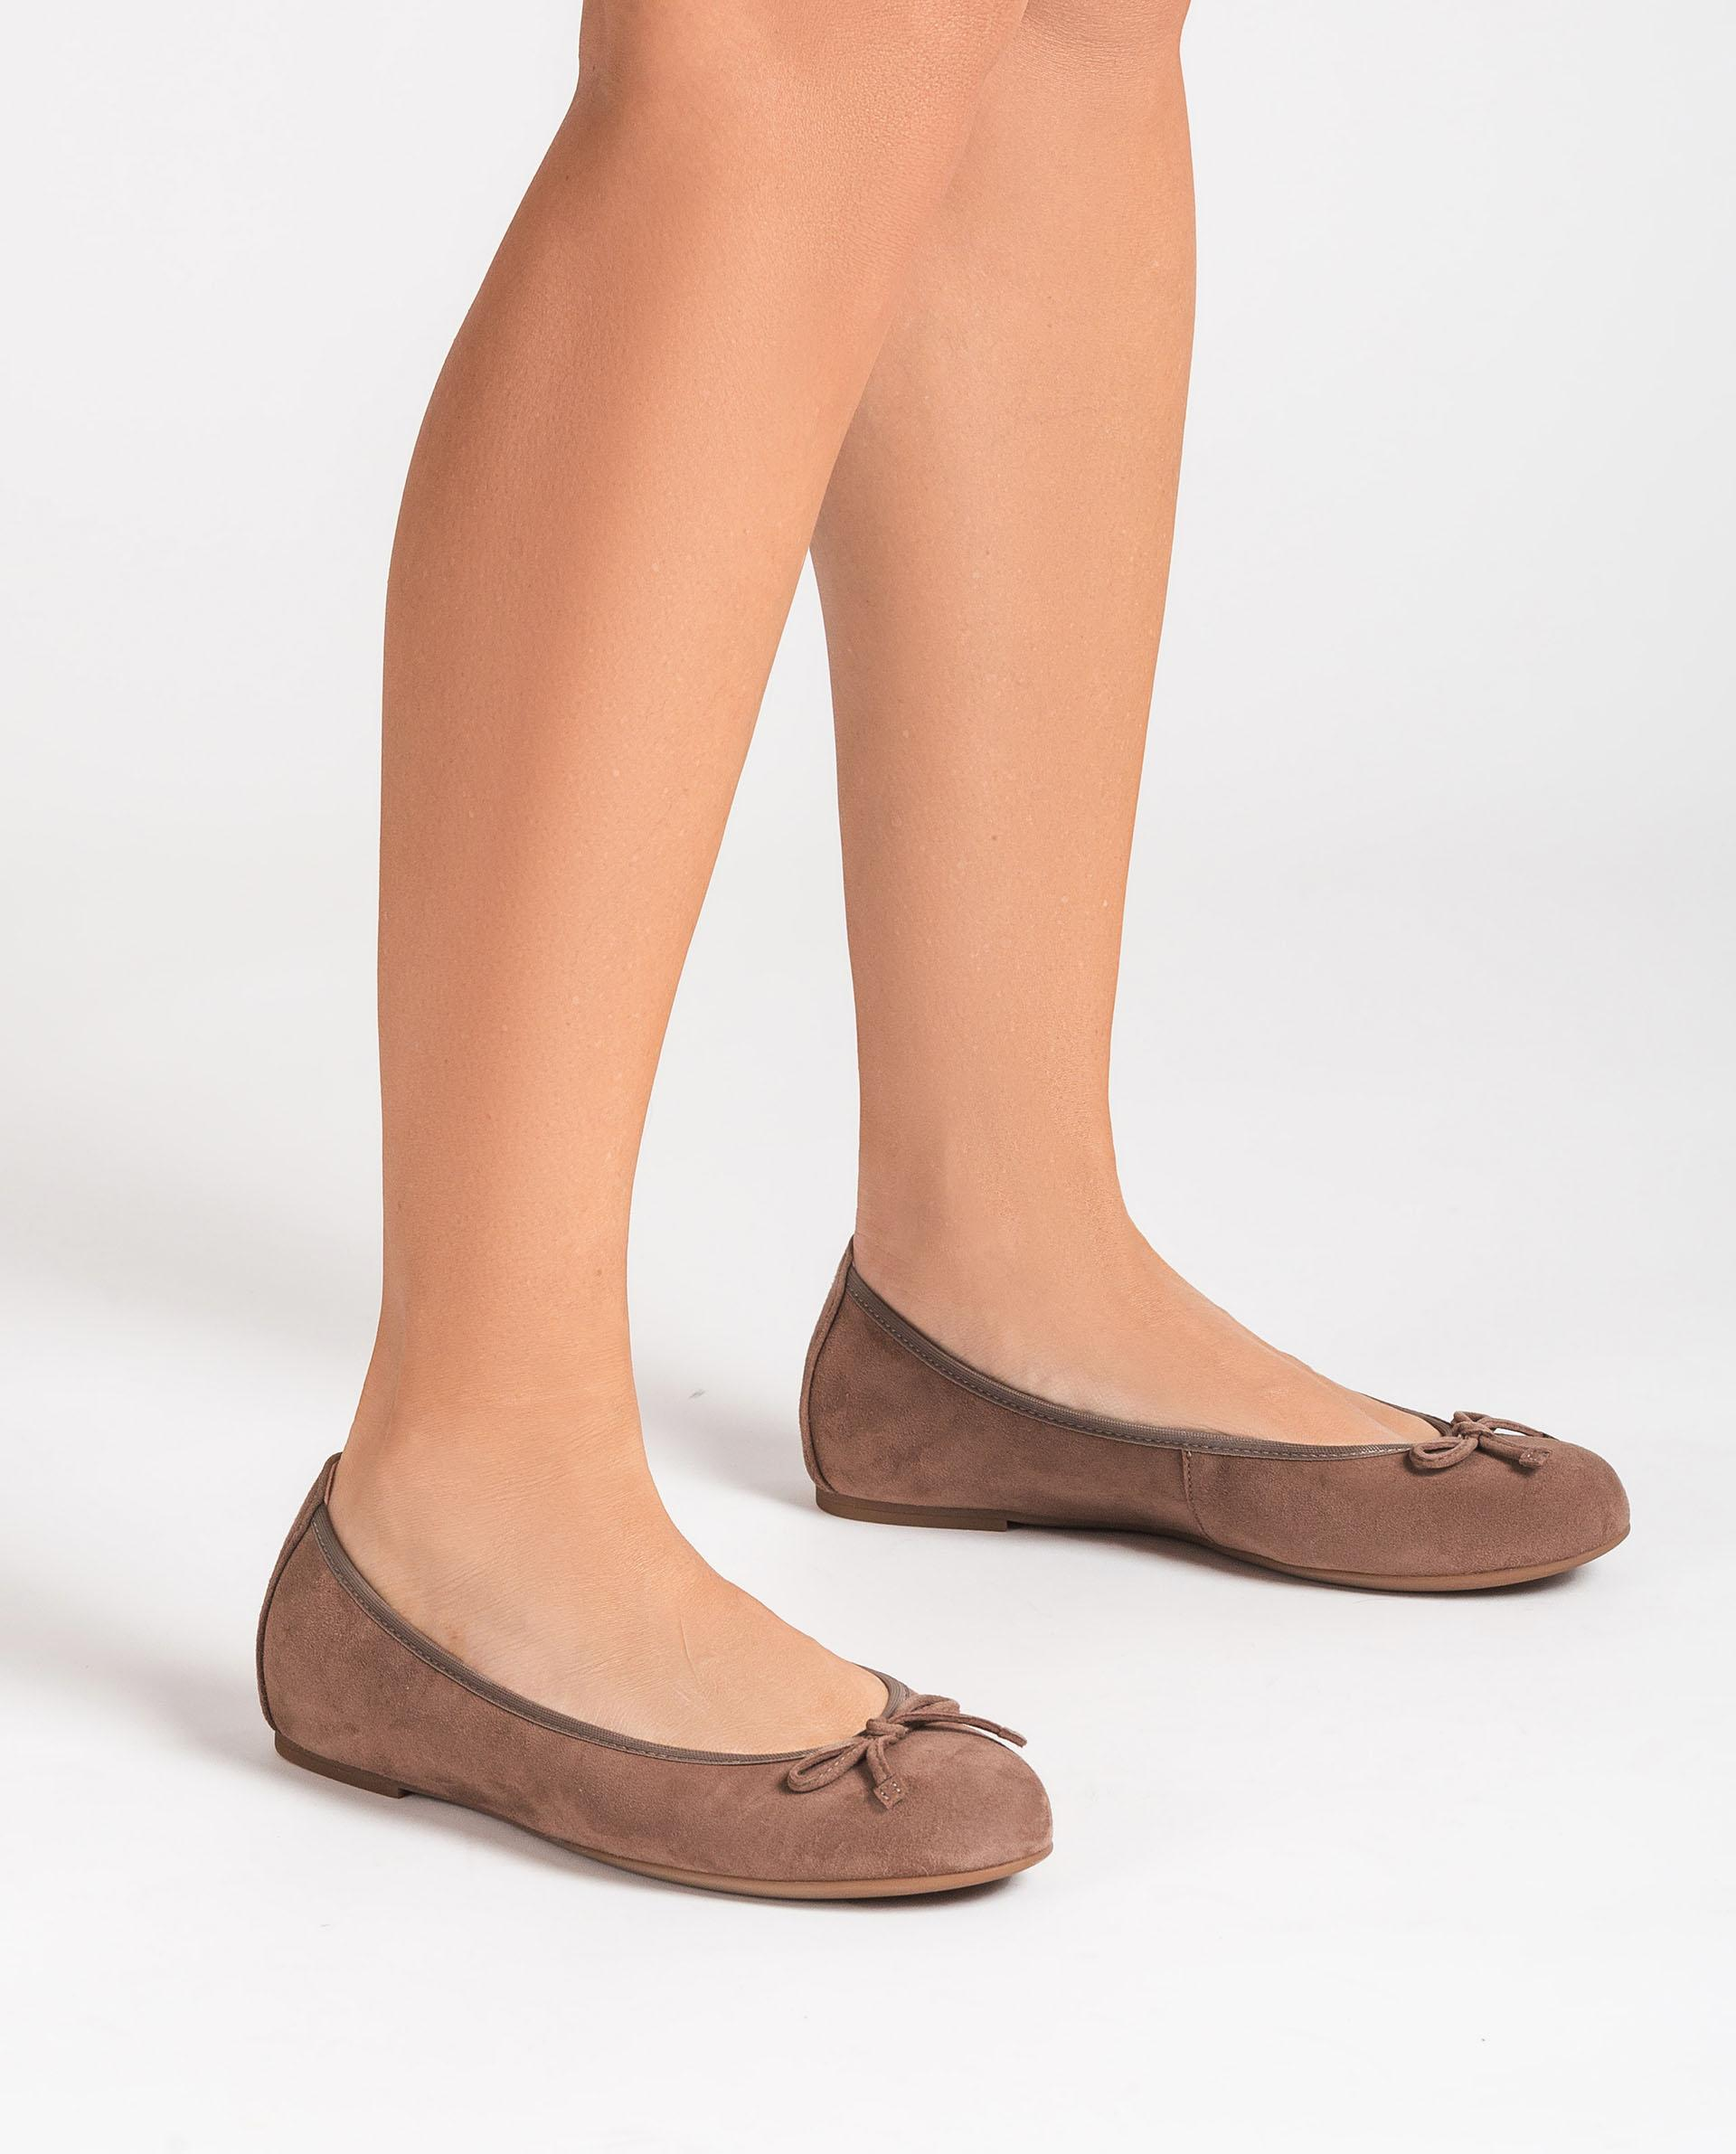 UNISA Kid suede ballerinas round toe ACOR_21_KS 2